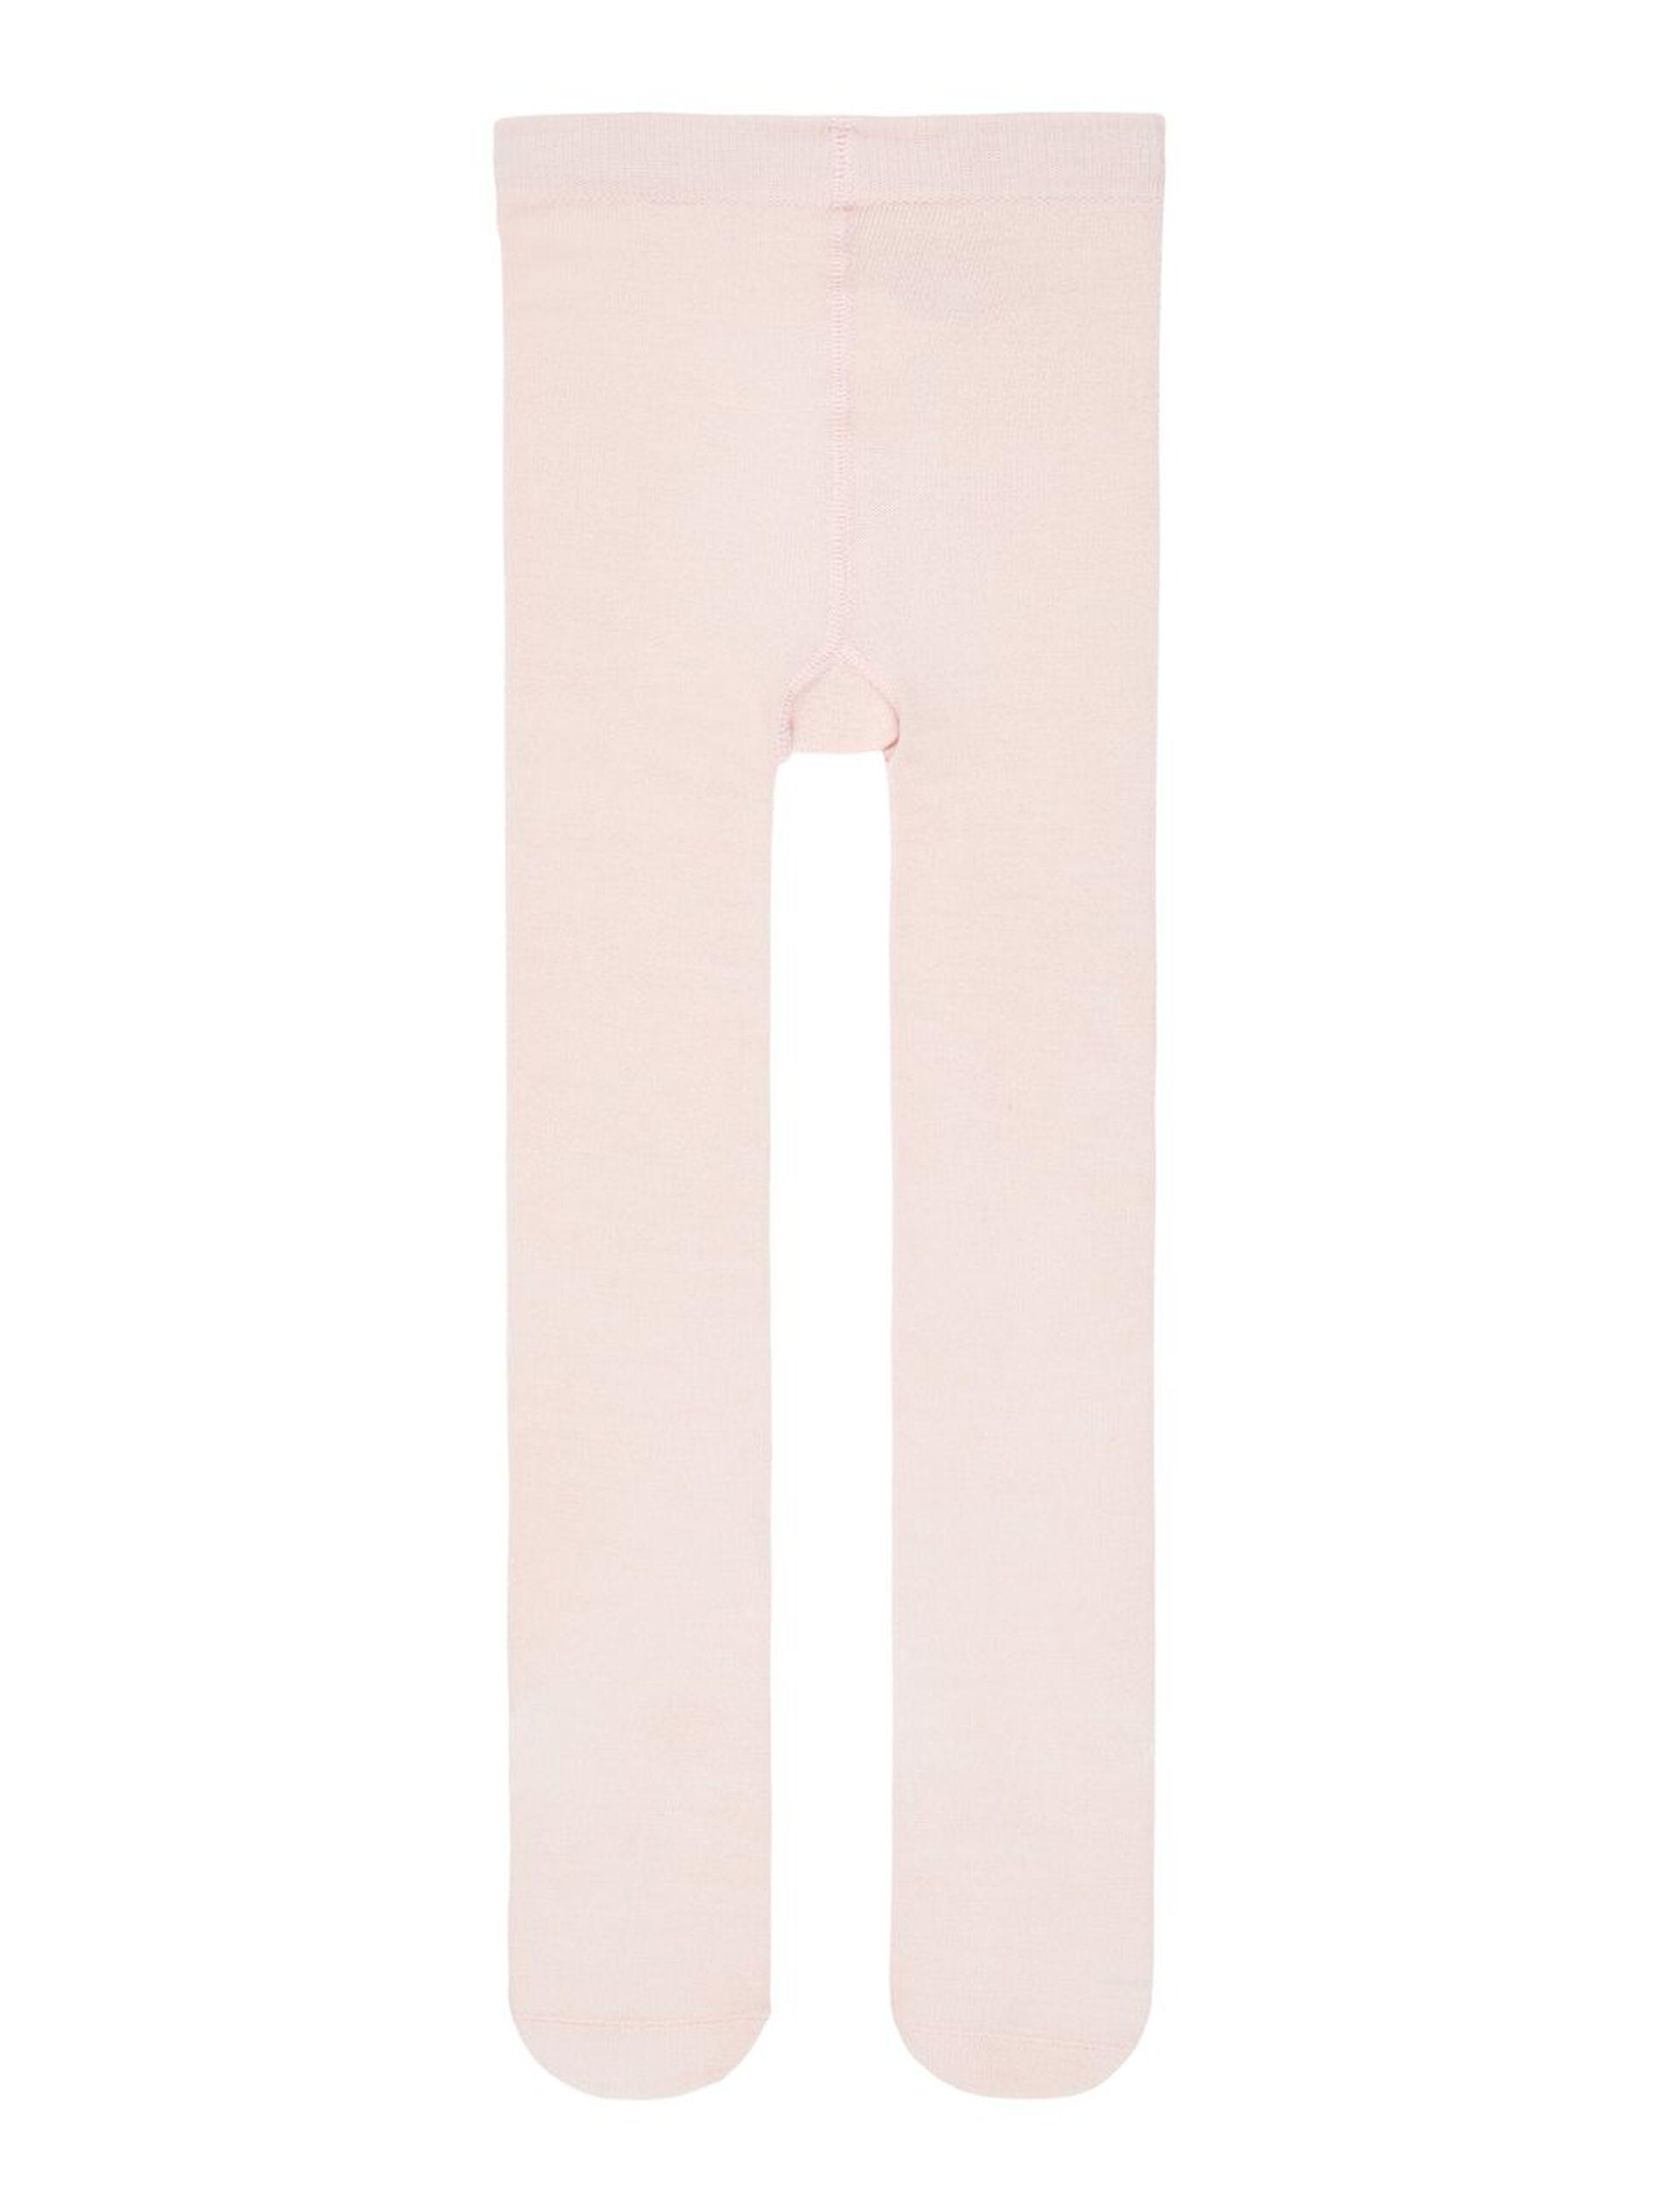 Rosa strømpebukse ull